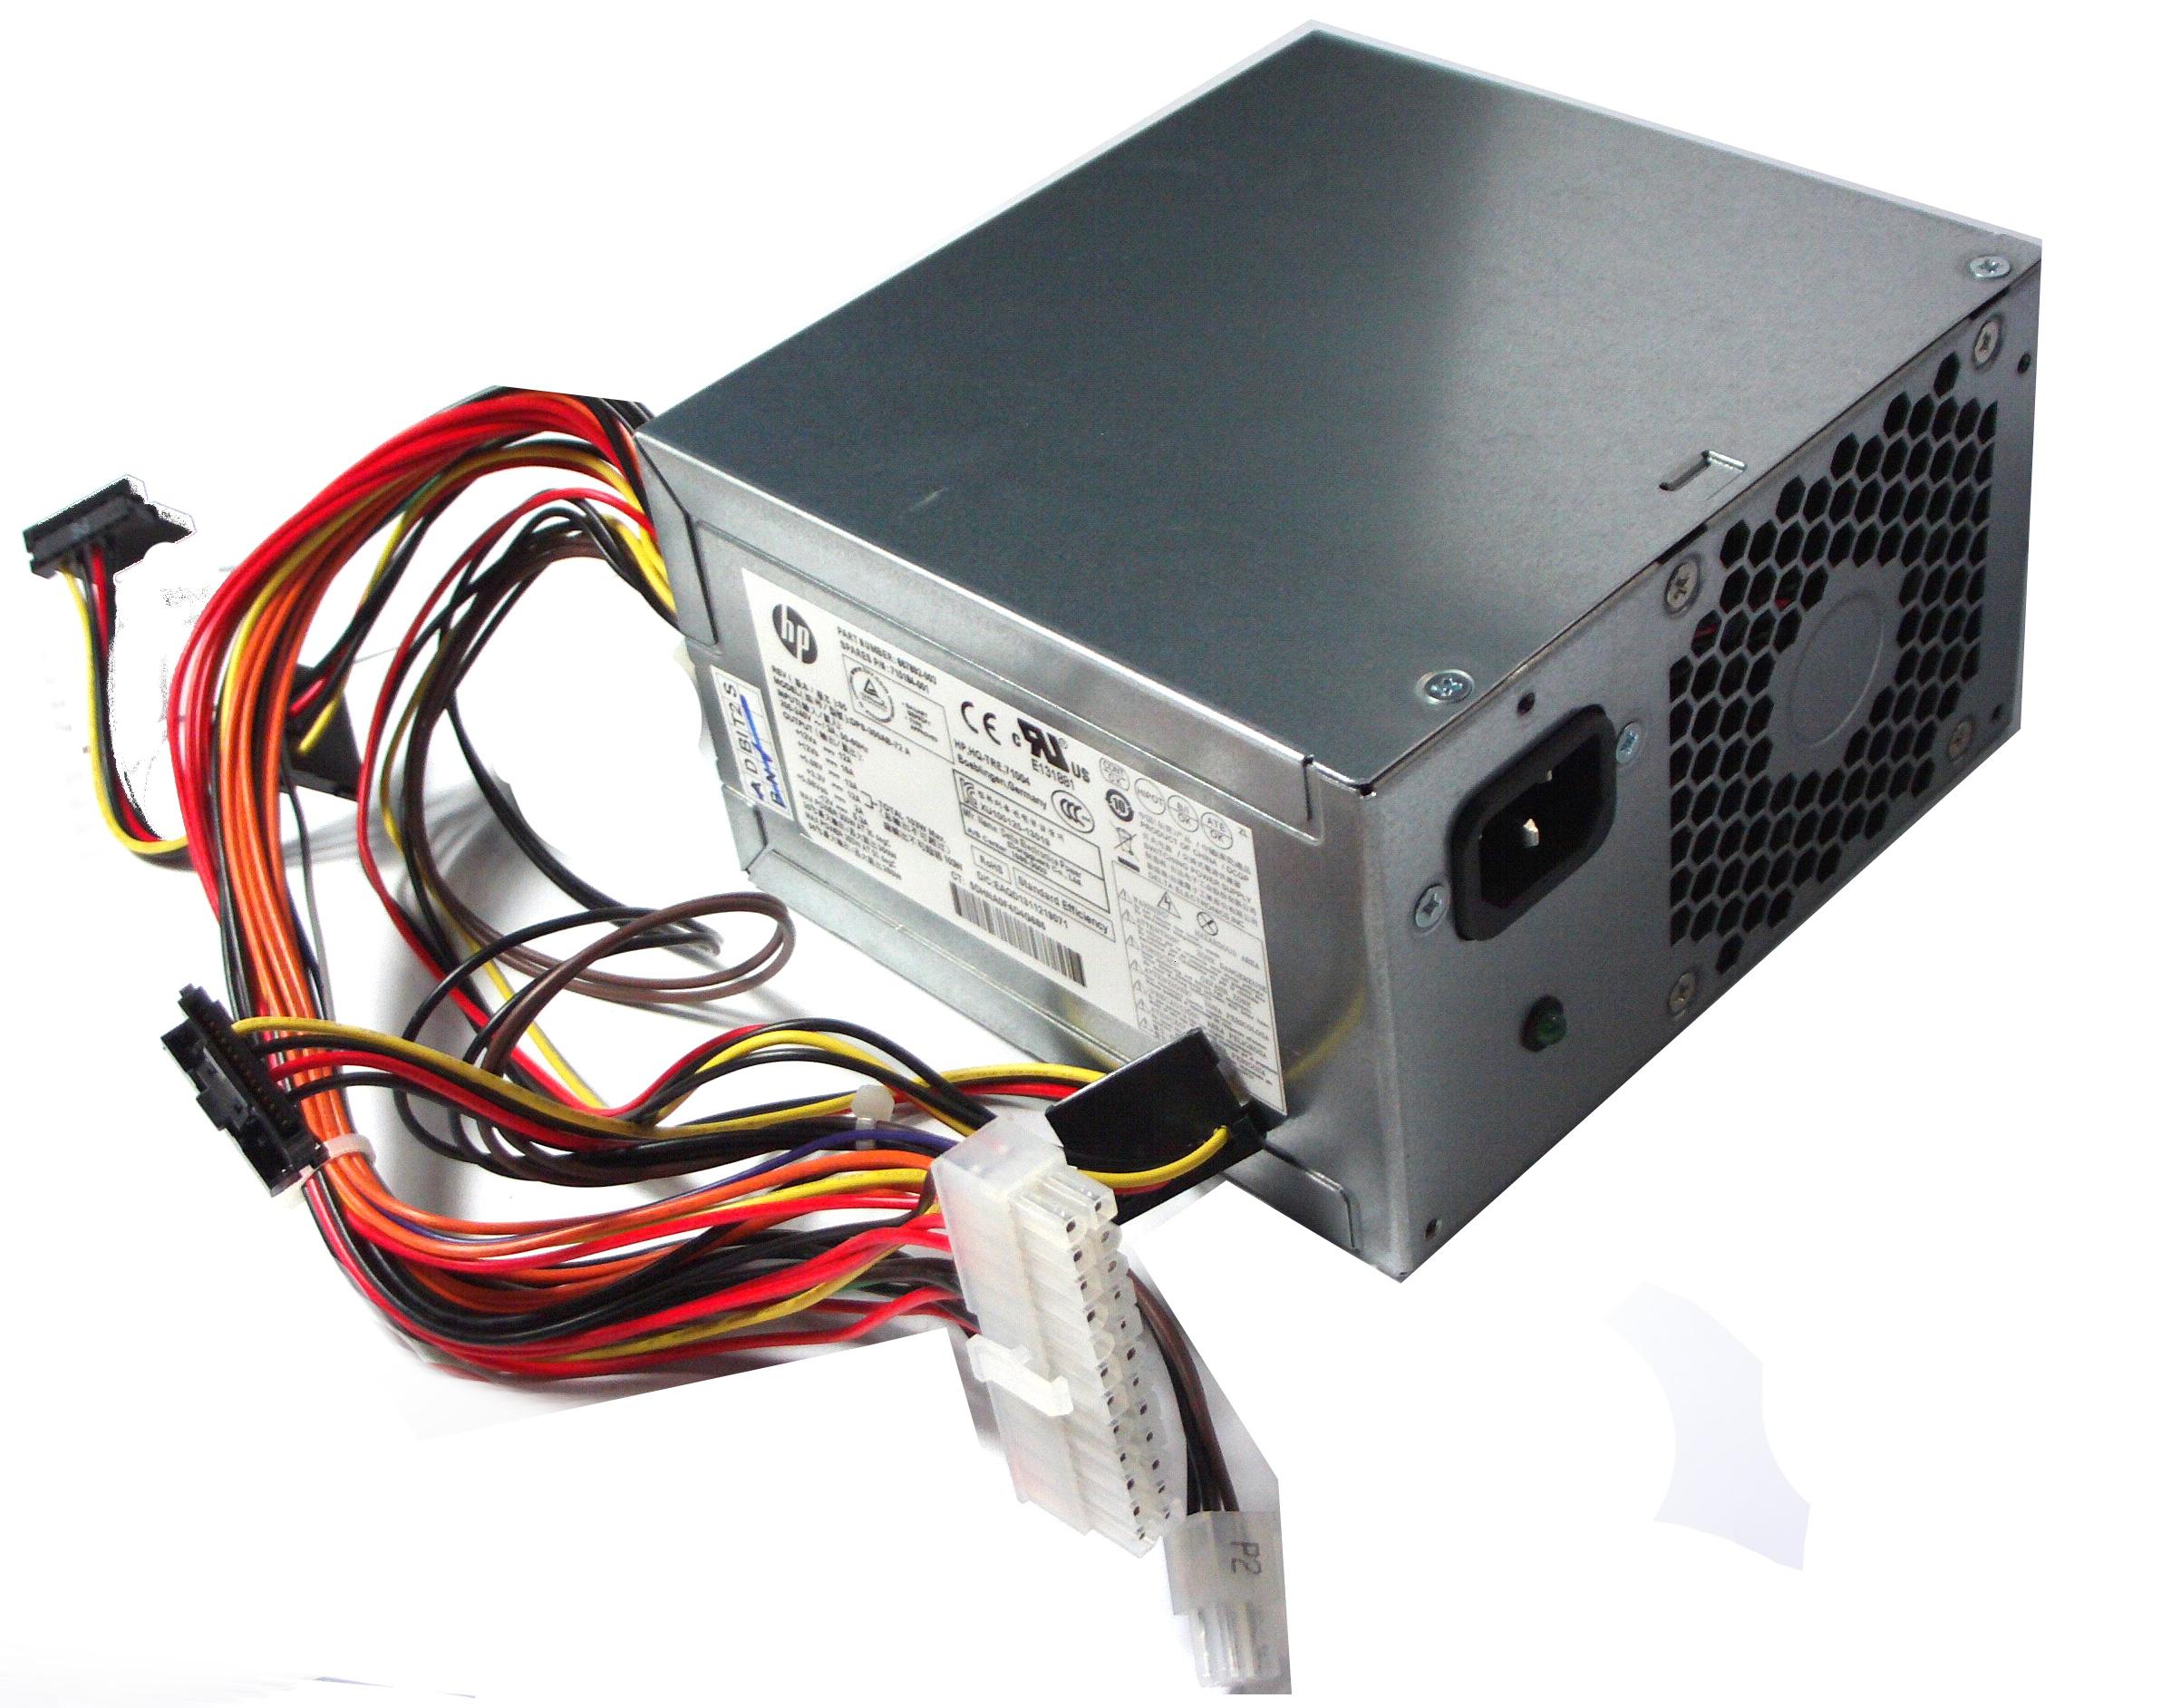 715184-001 HP DPS-300AB-72 300W Delta ATX Power Supply Unit 667892-003